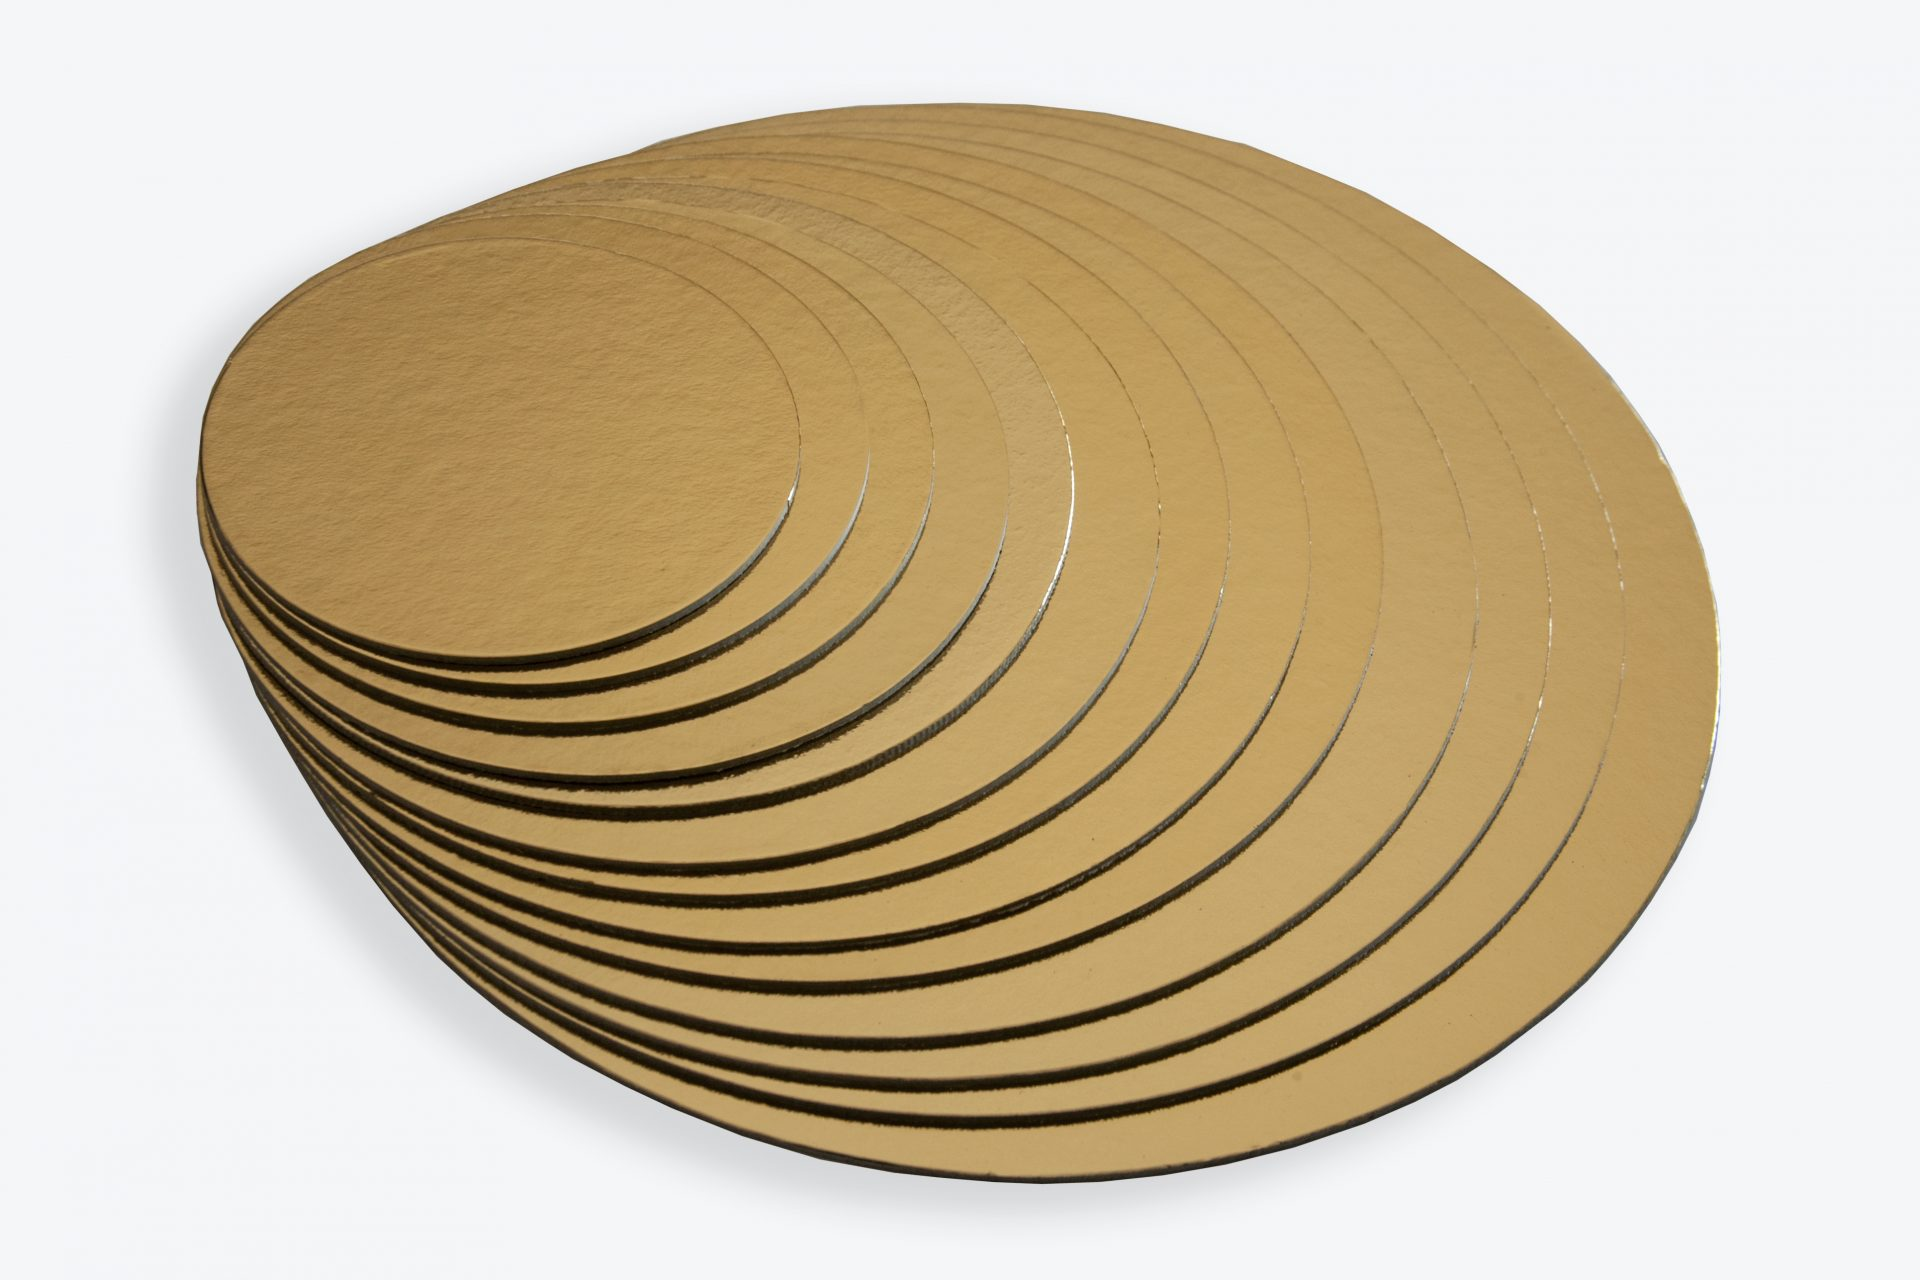 Papier Kuchenbrett